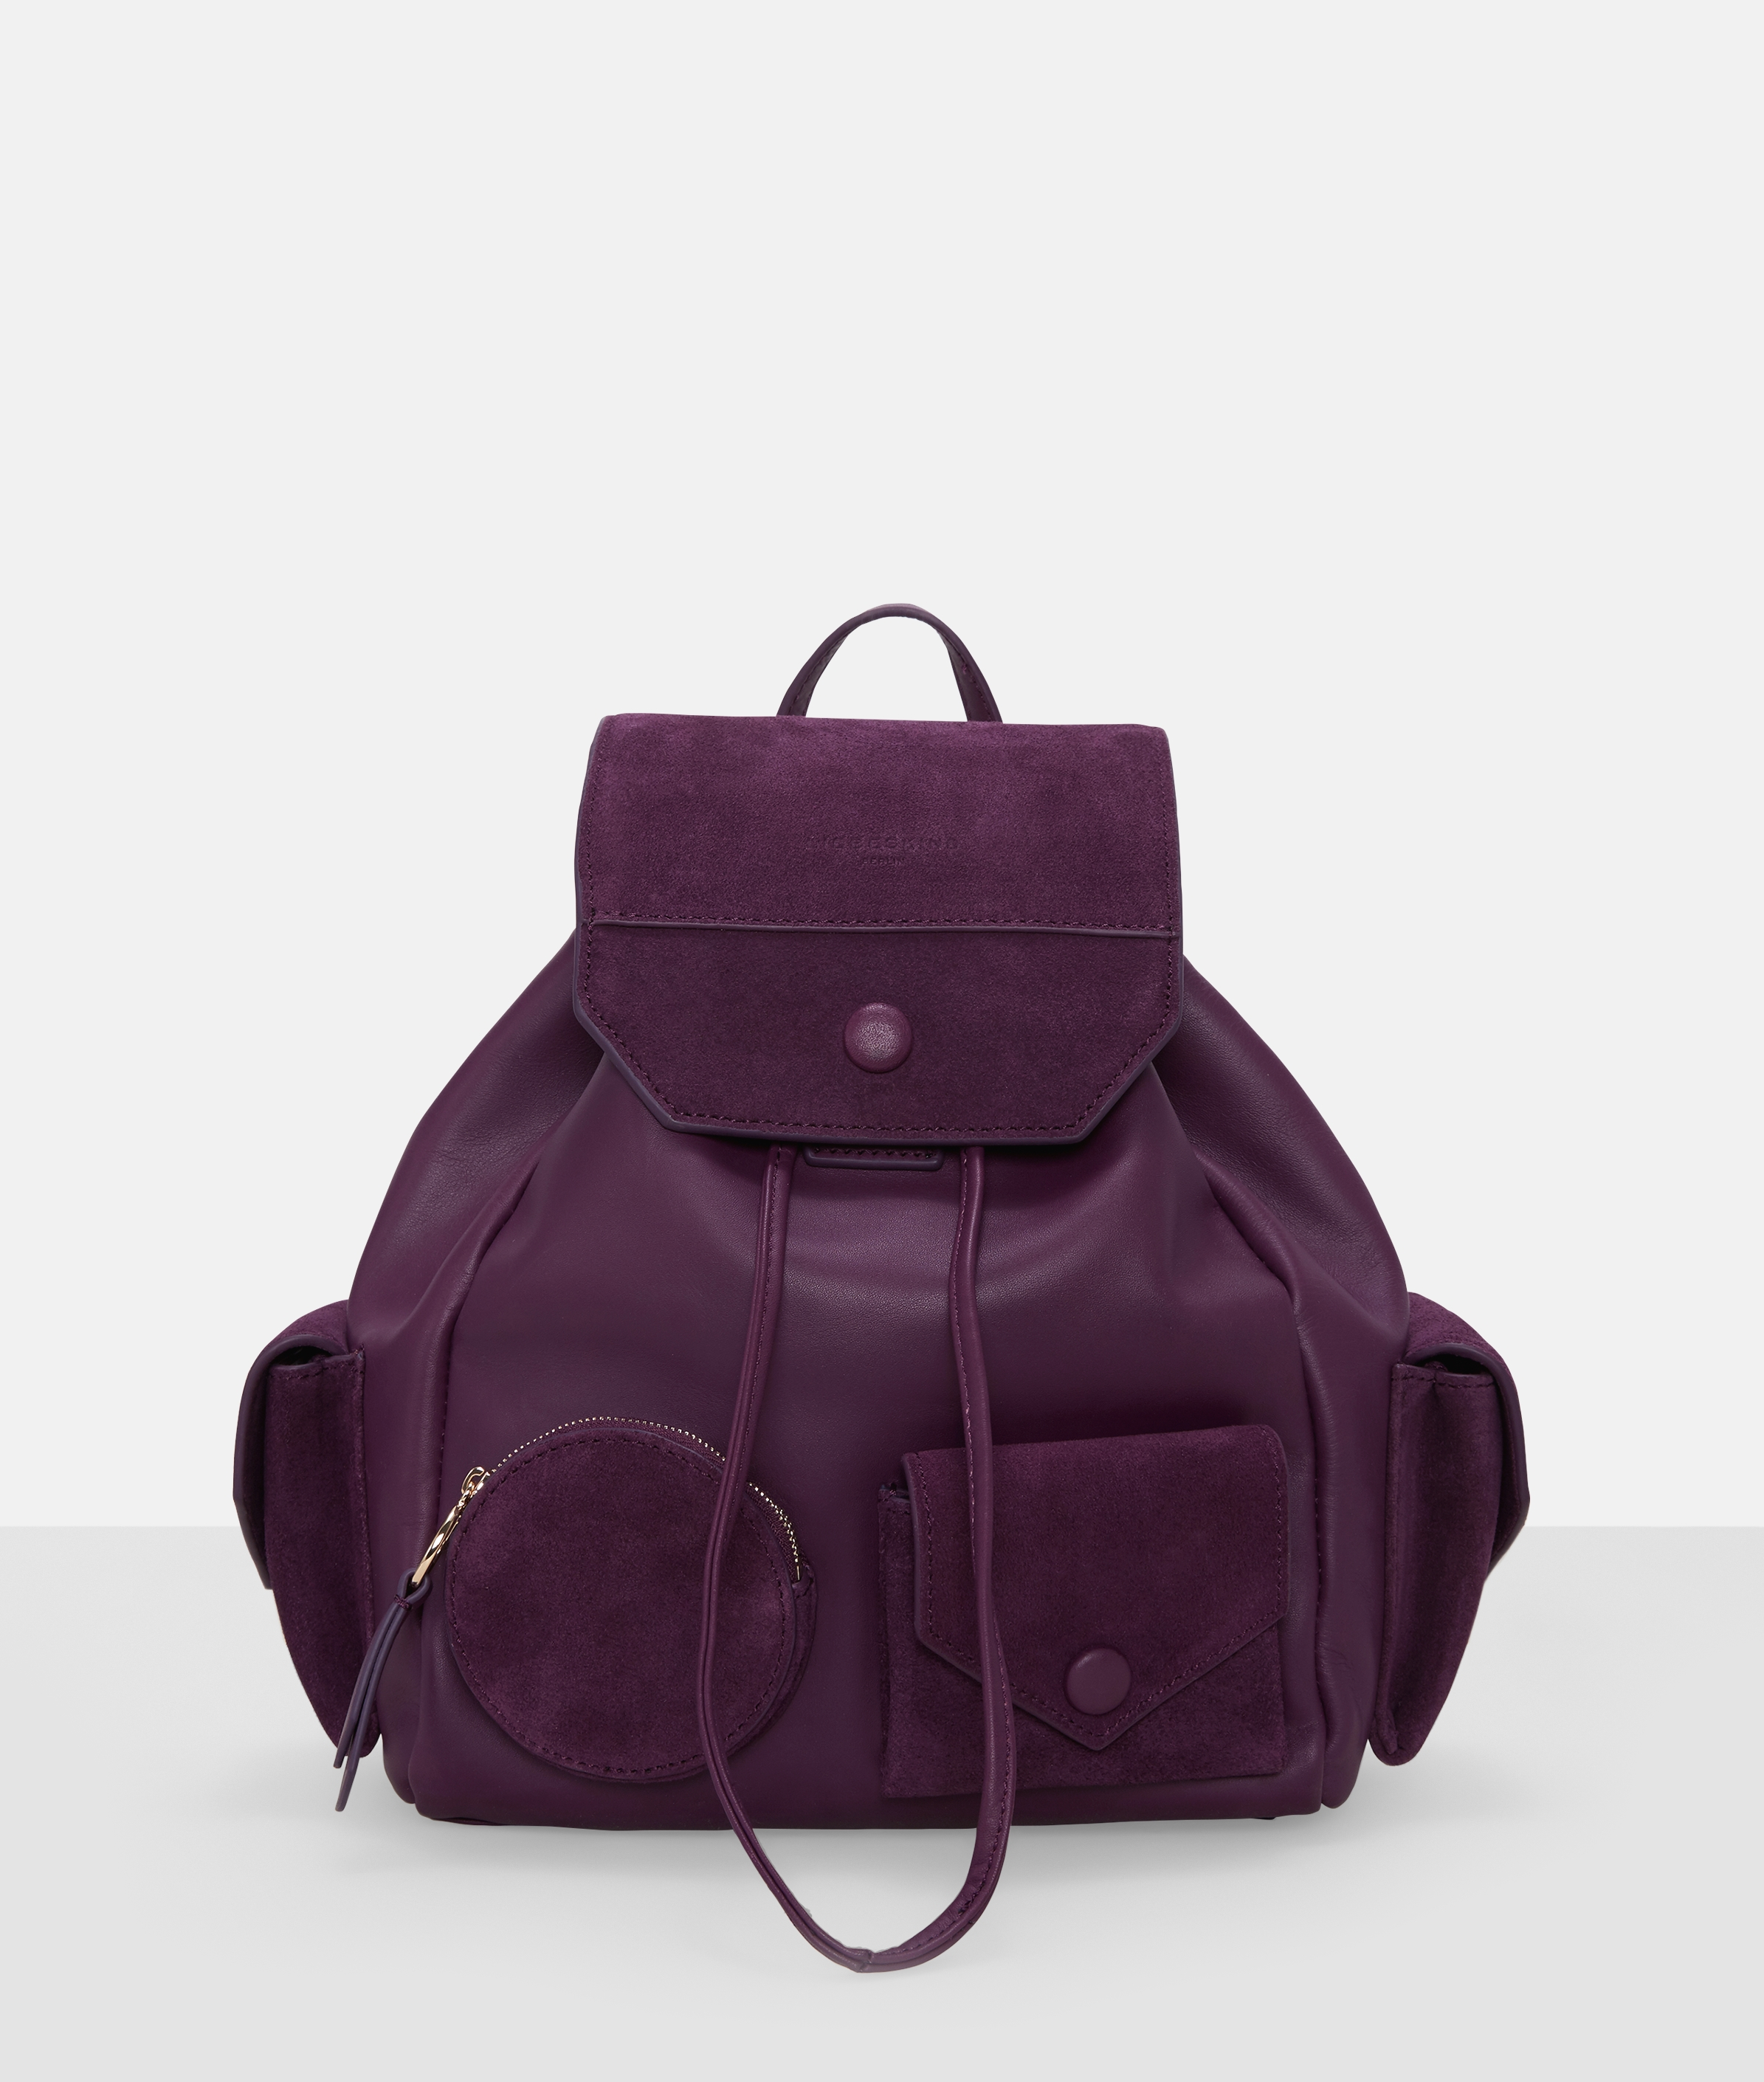 Berlin Tasche Casual Pocket Backpack M, Pink